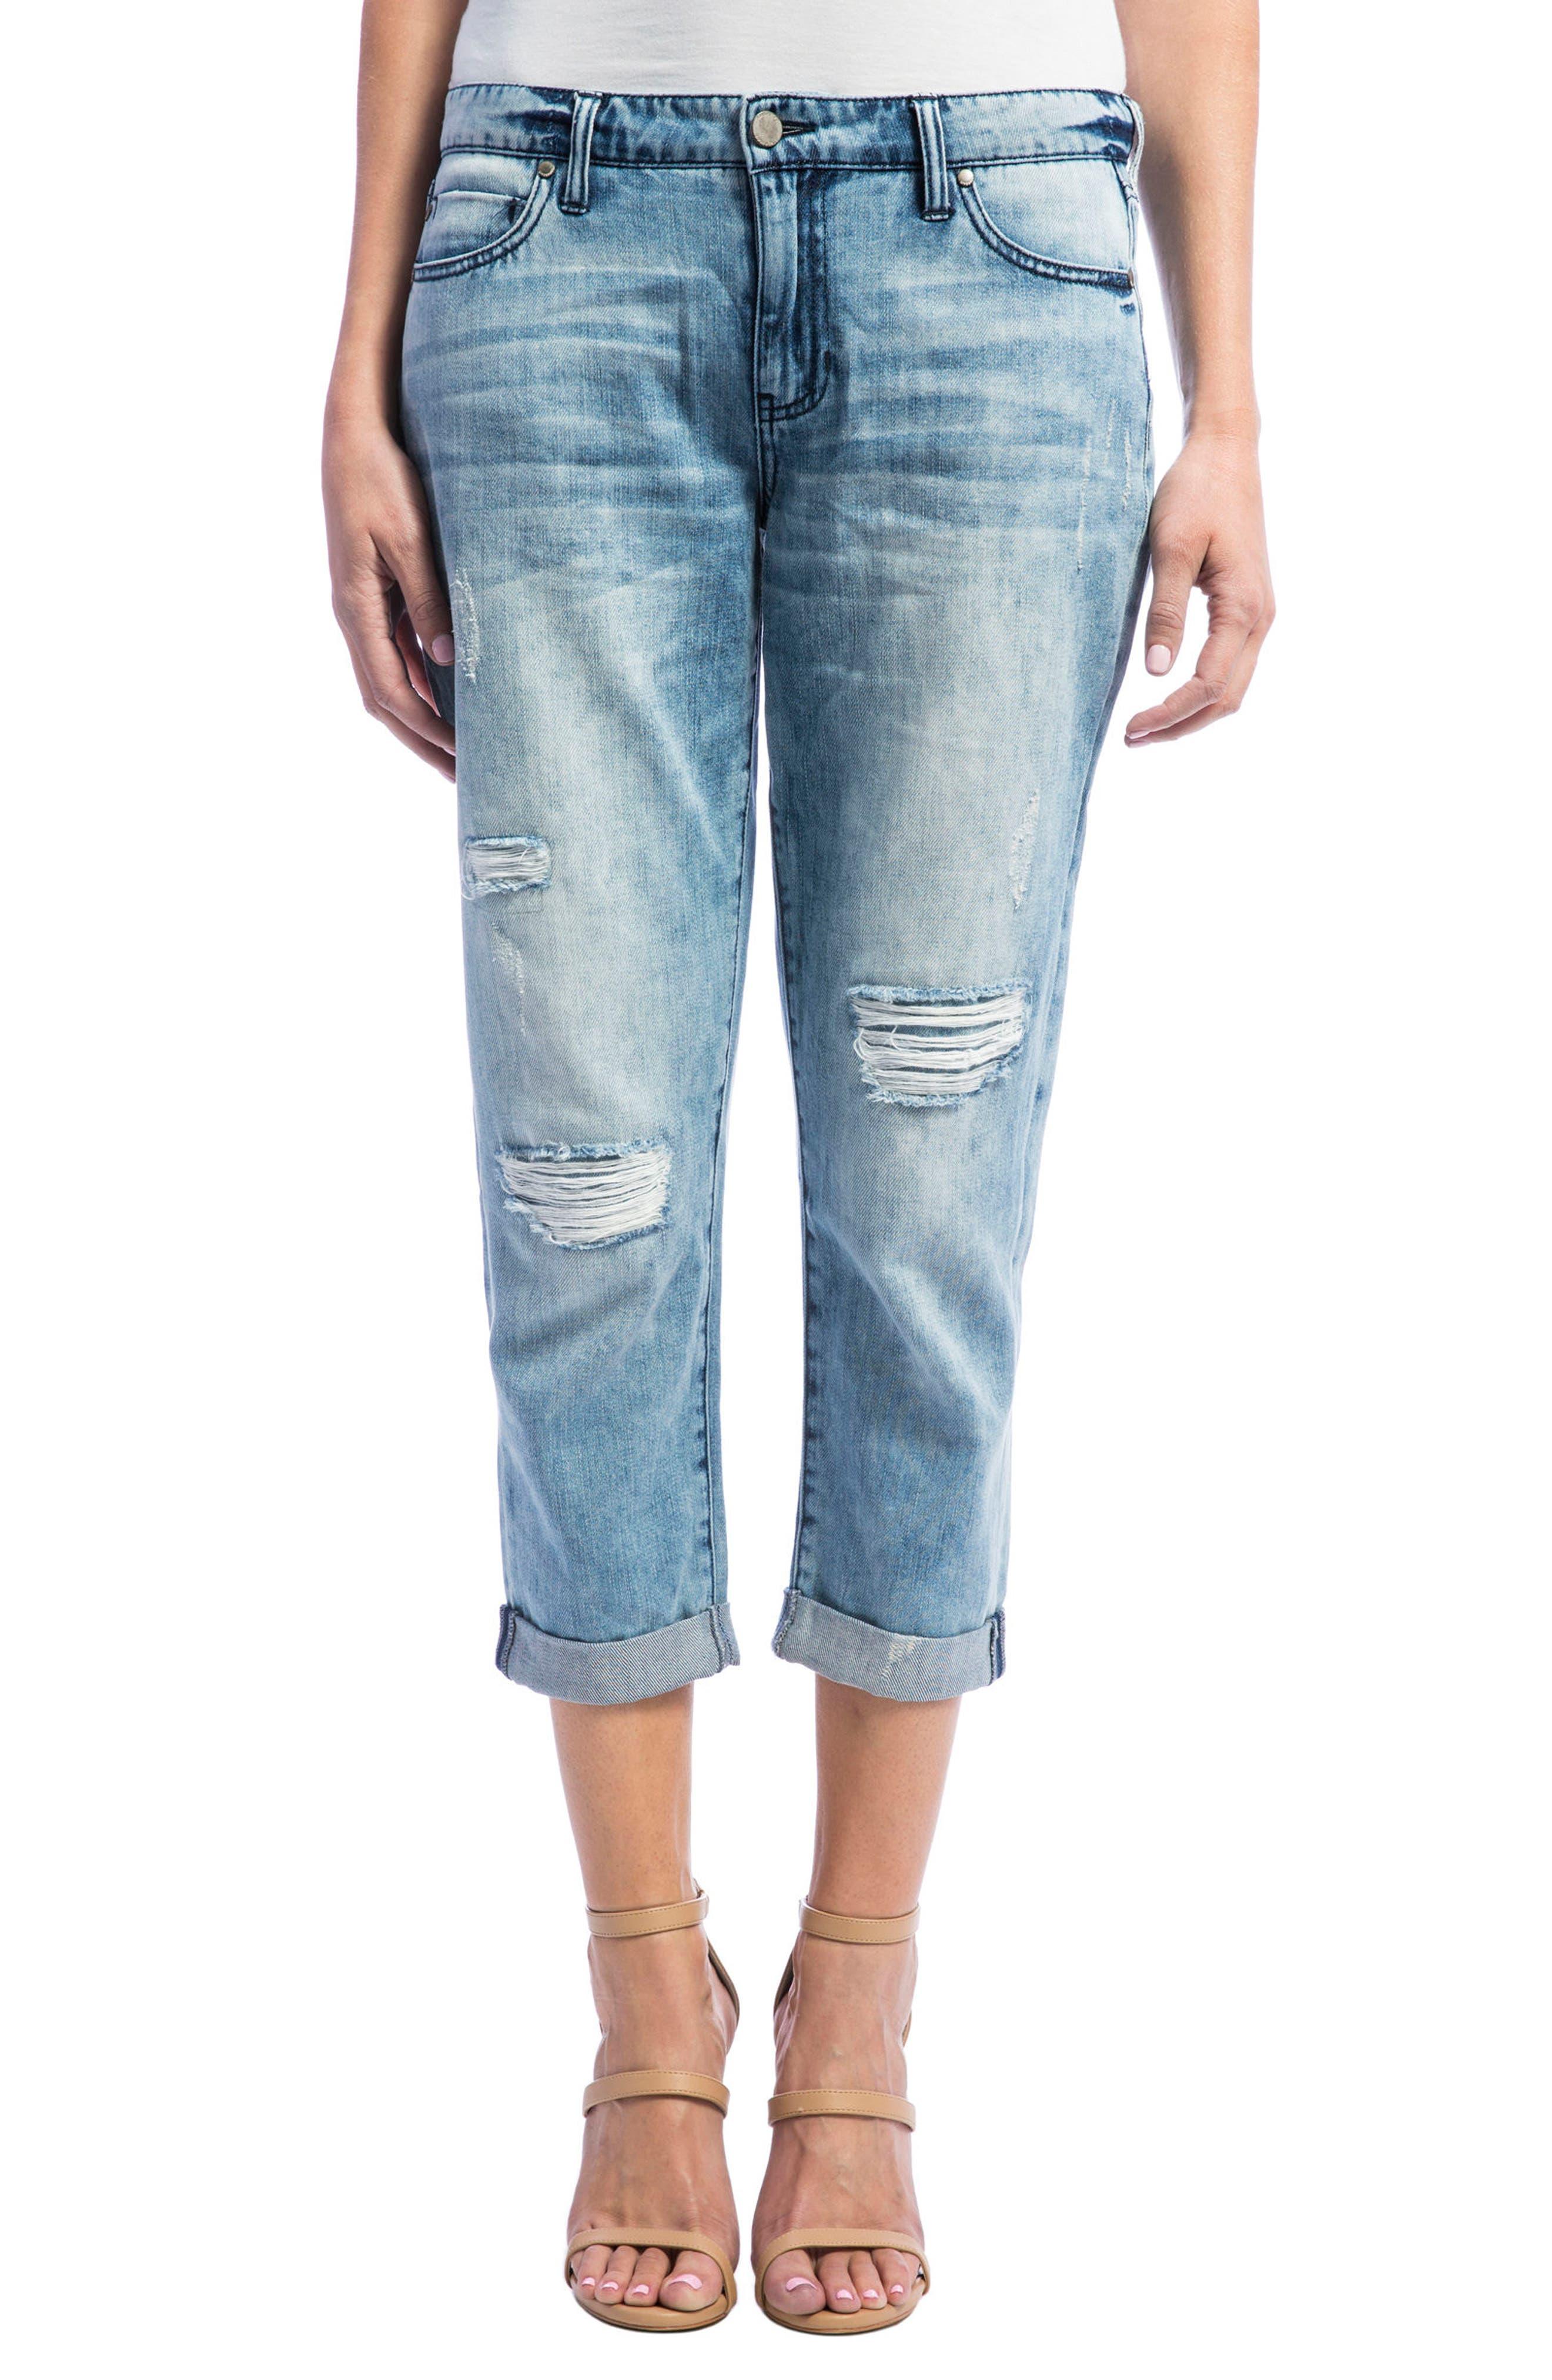 Alternate Image 1 Selected - Liverpool Jeans Company Cameron Crop Boyfriend Jeans